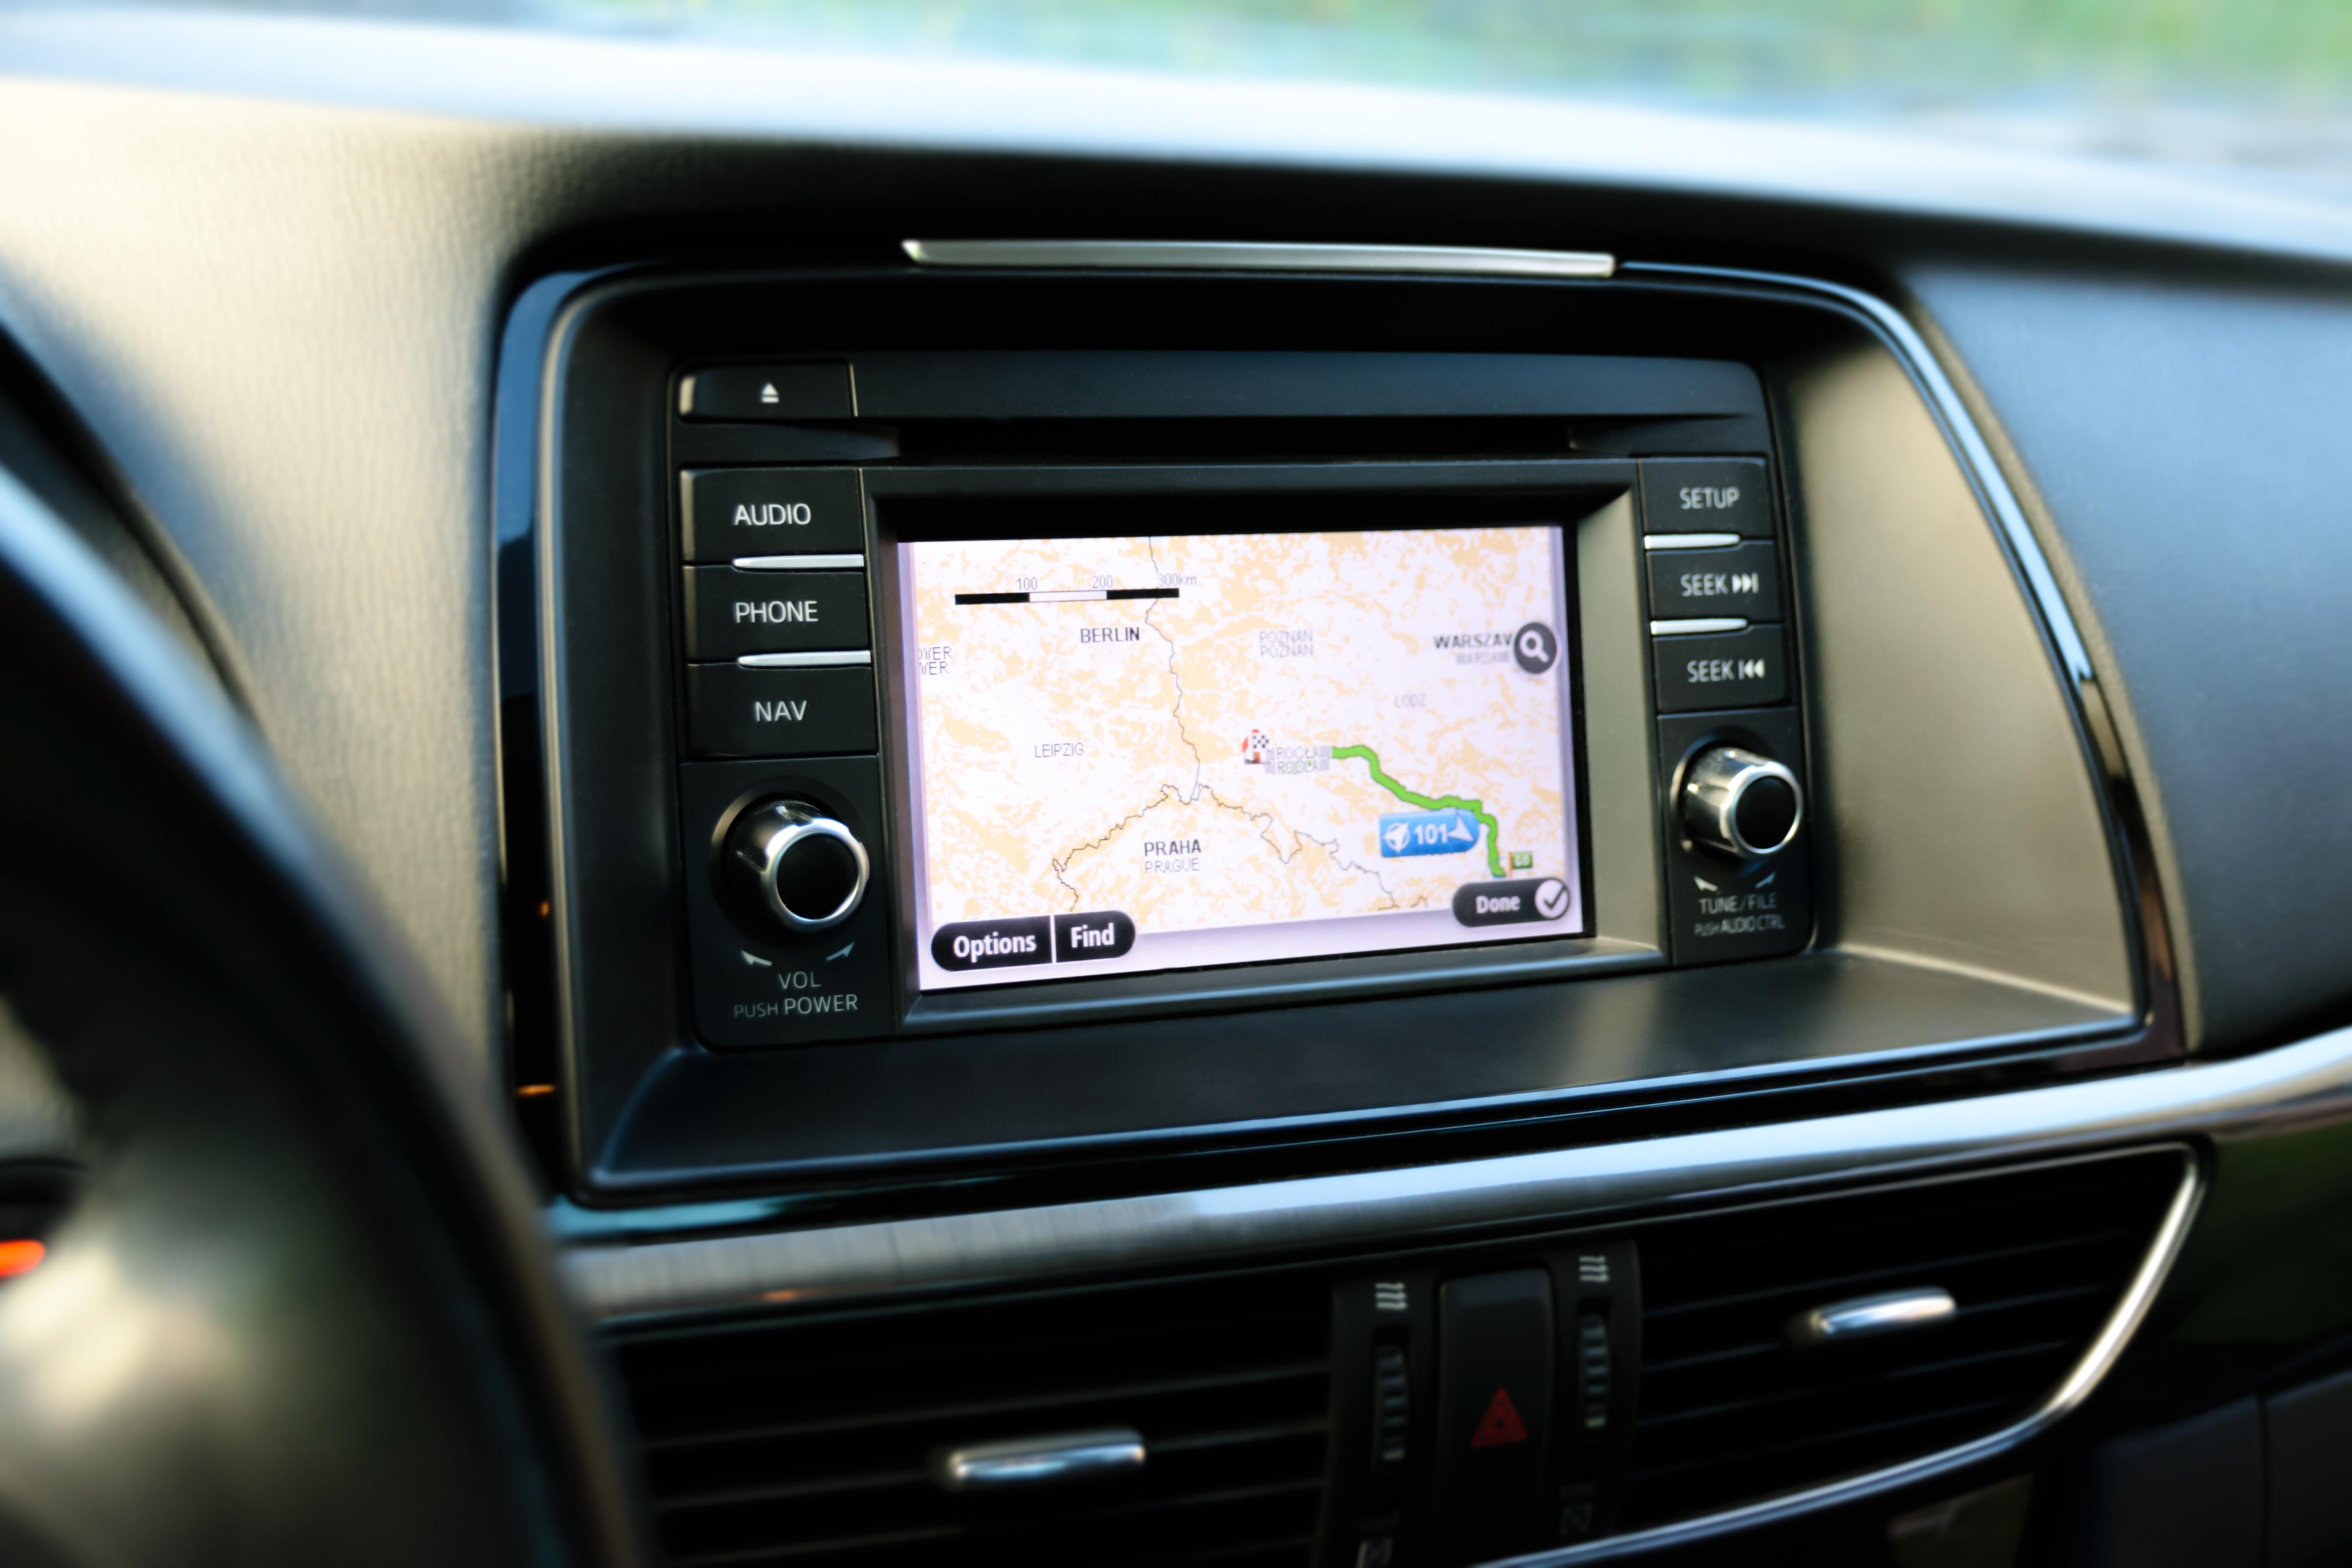 Satellite navigation system